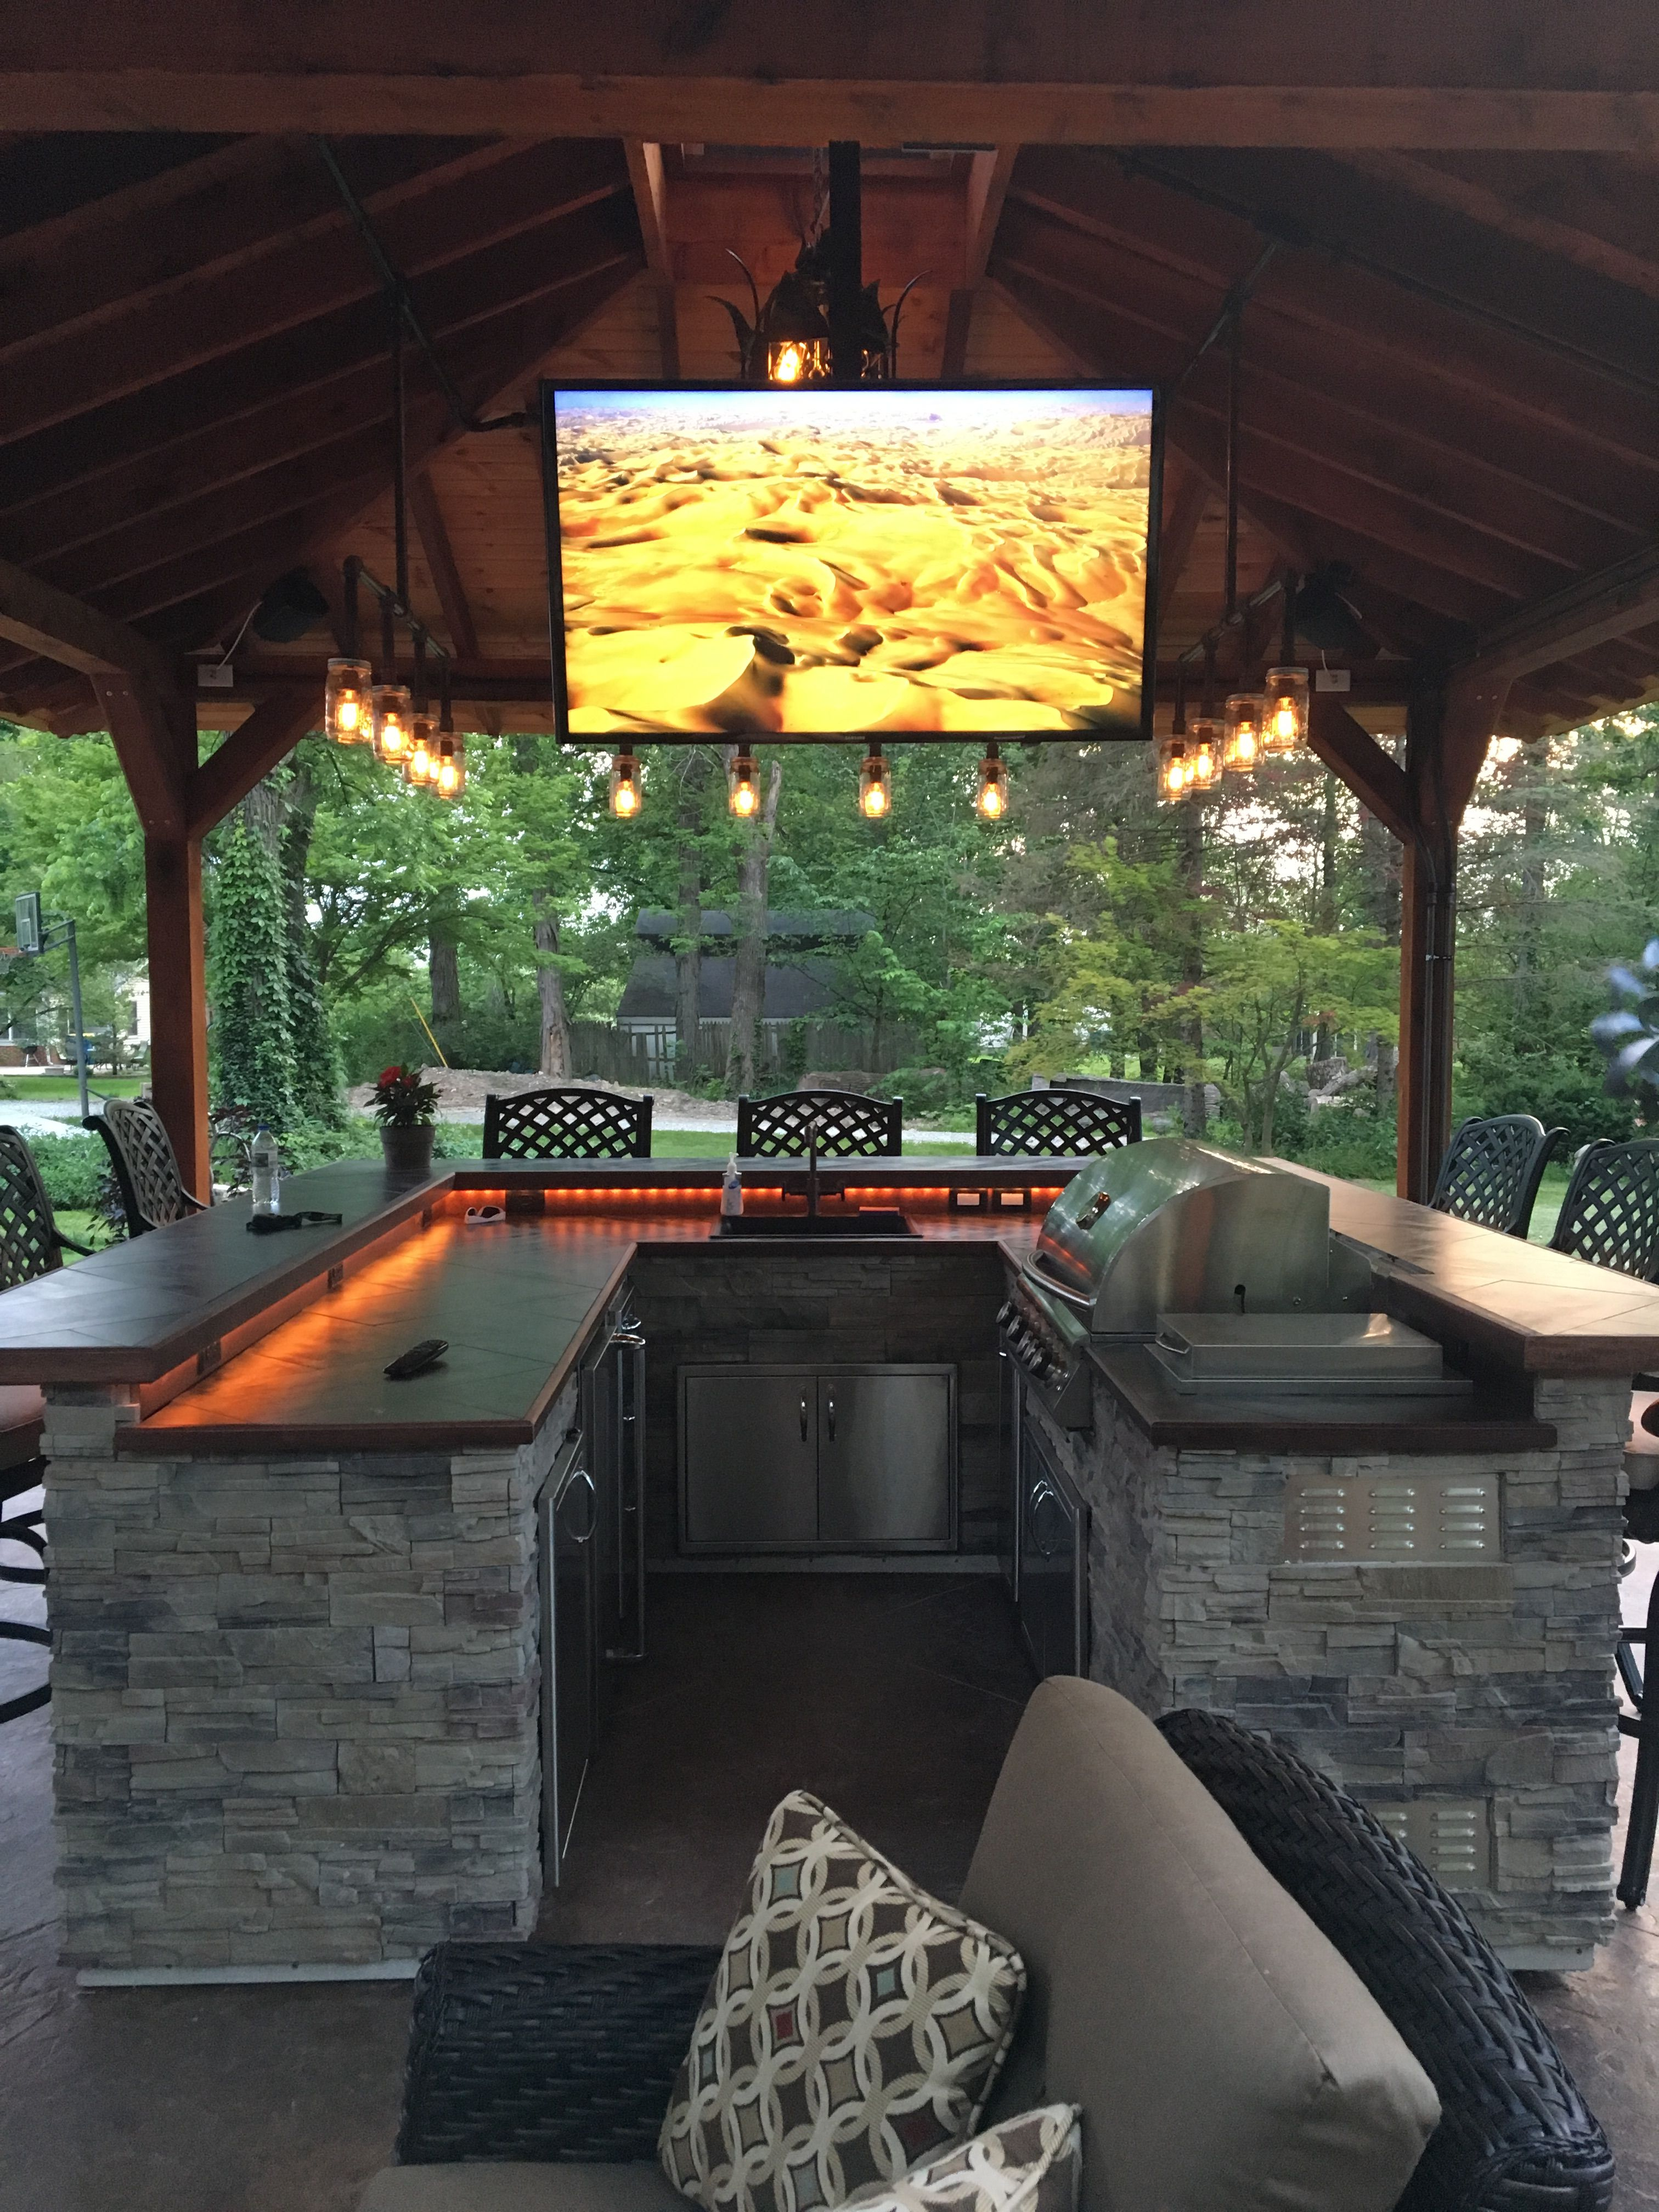 cedar outdoor kitchen patio bar stools iron pipe lights patio rh pinterest com Patio Kitchens Designs wilshire bar kitchen patio